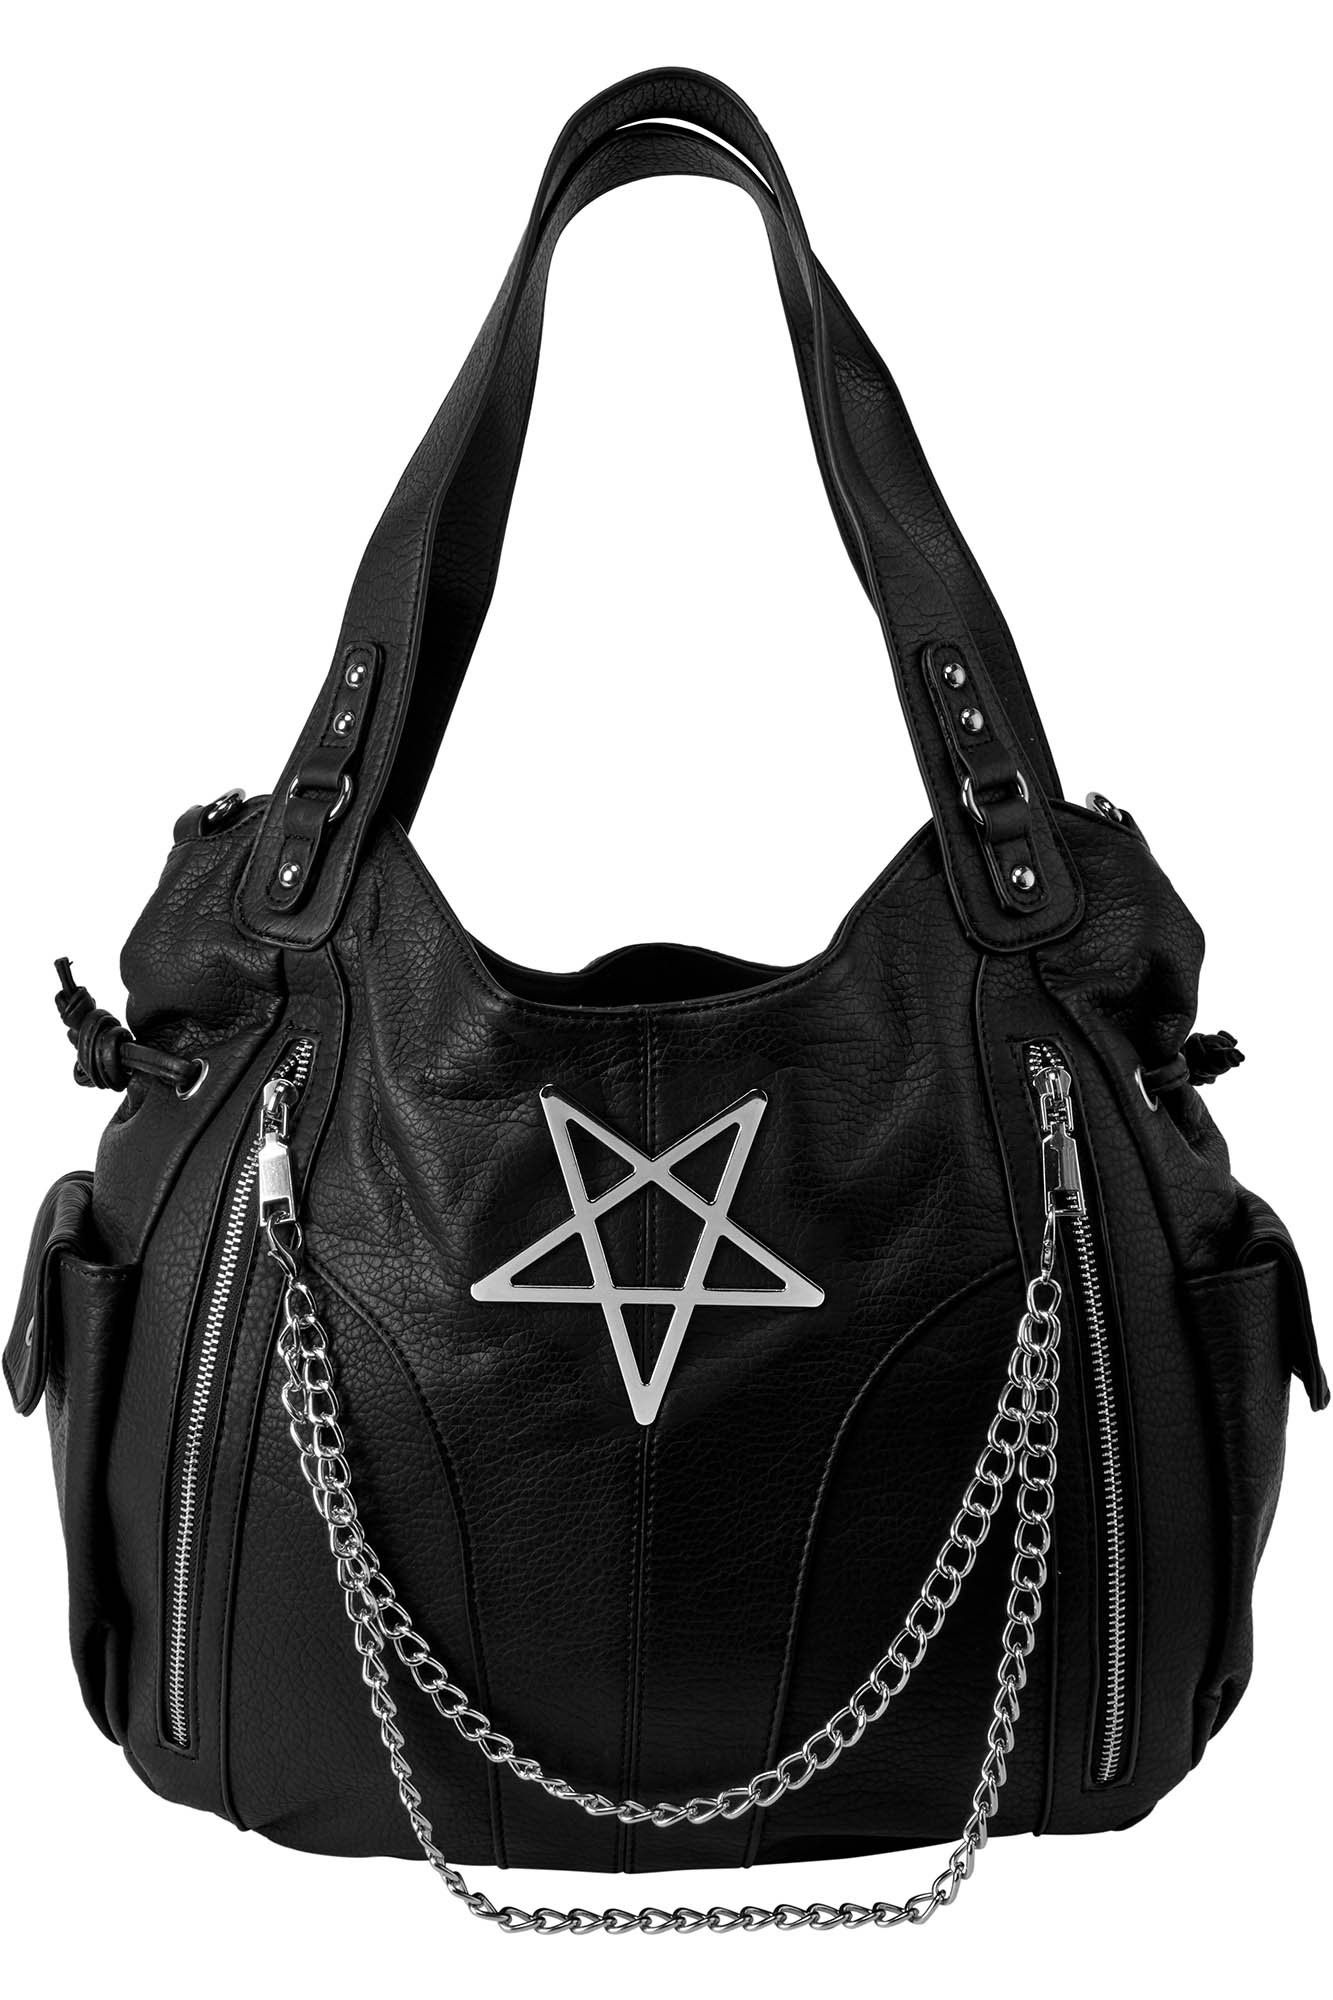 Banned Pentagram Illuminati Large Straps Rockabilly Punk Gothic Handbag BLACK